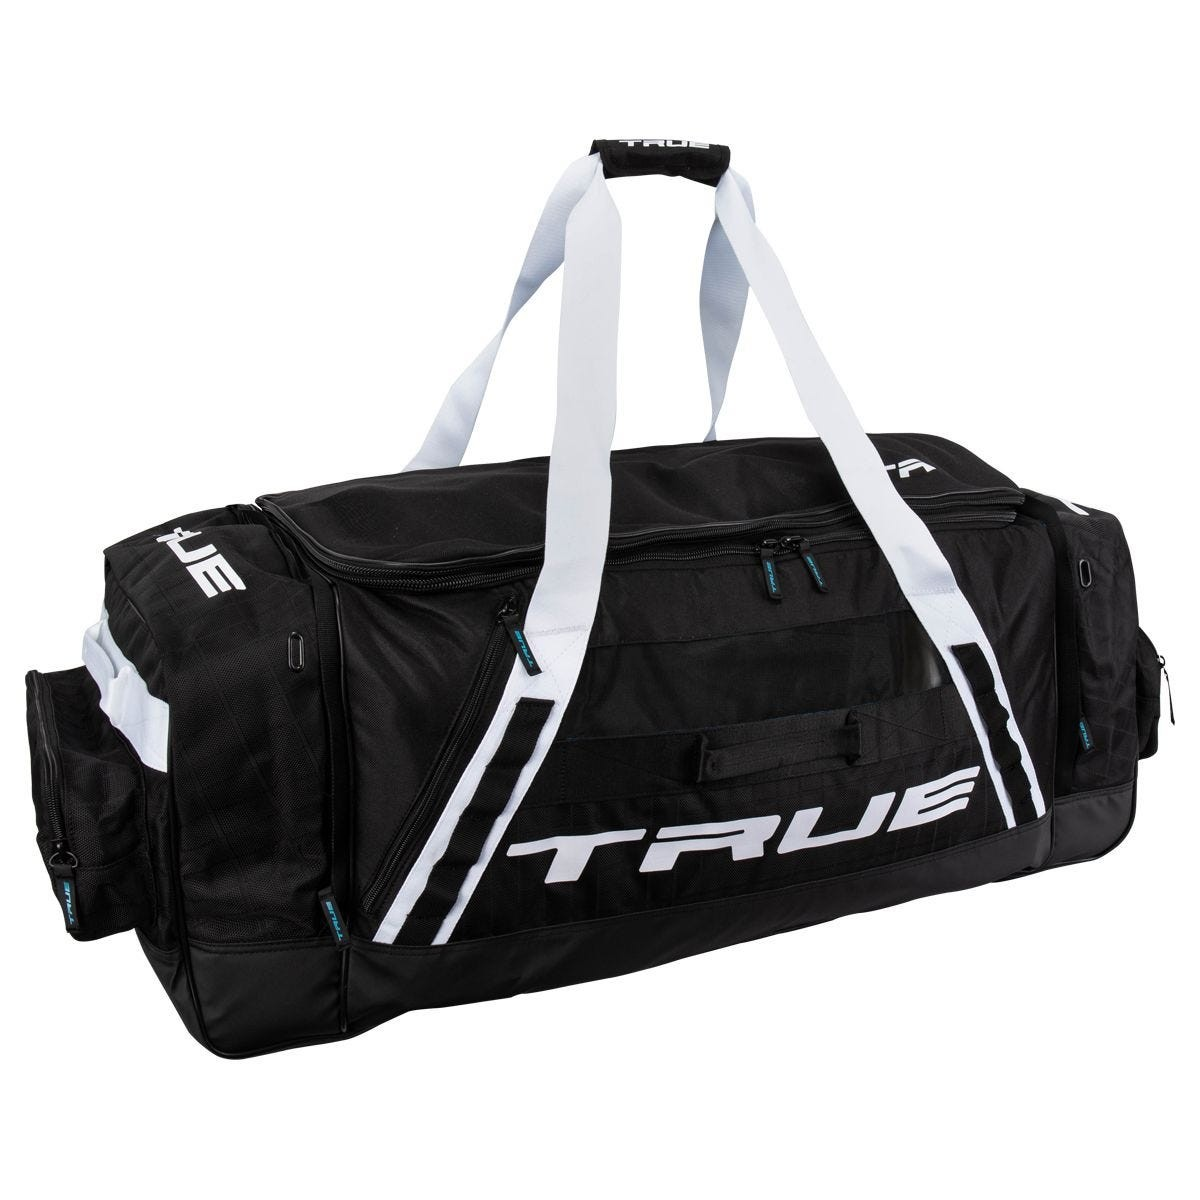 TRUE Elite Wheeled Equipment Bag